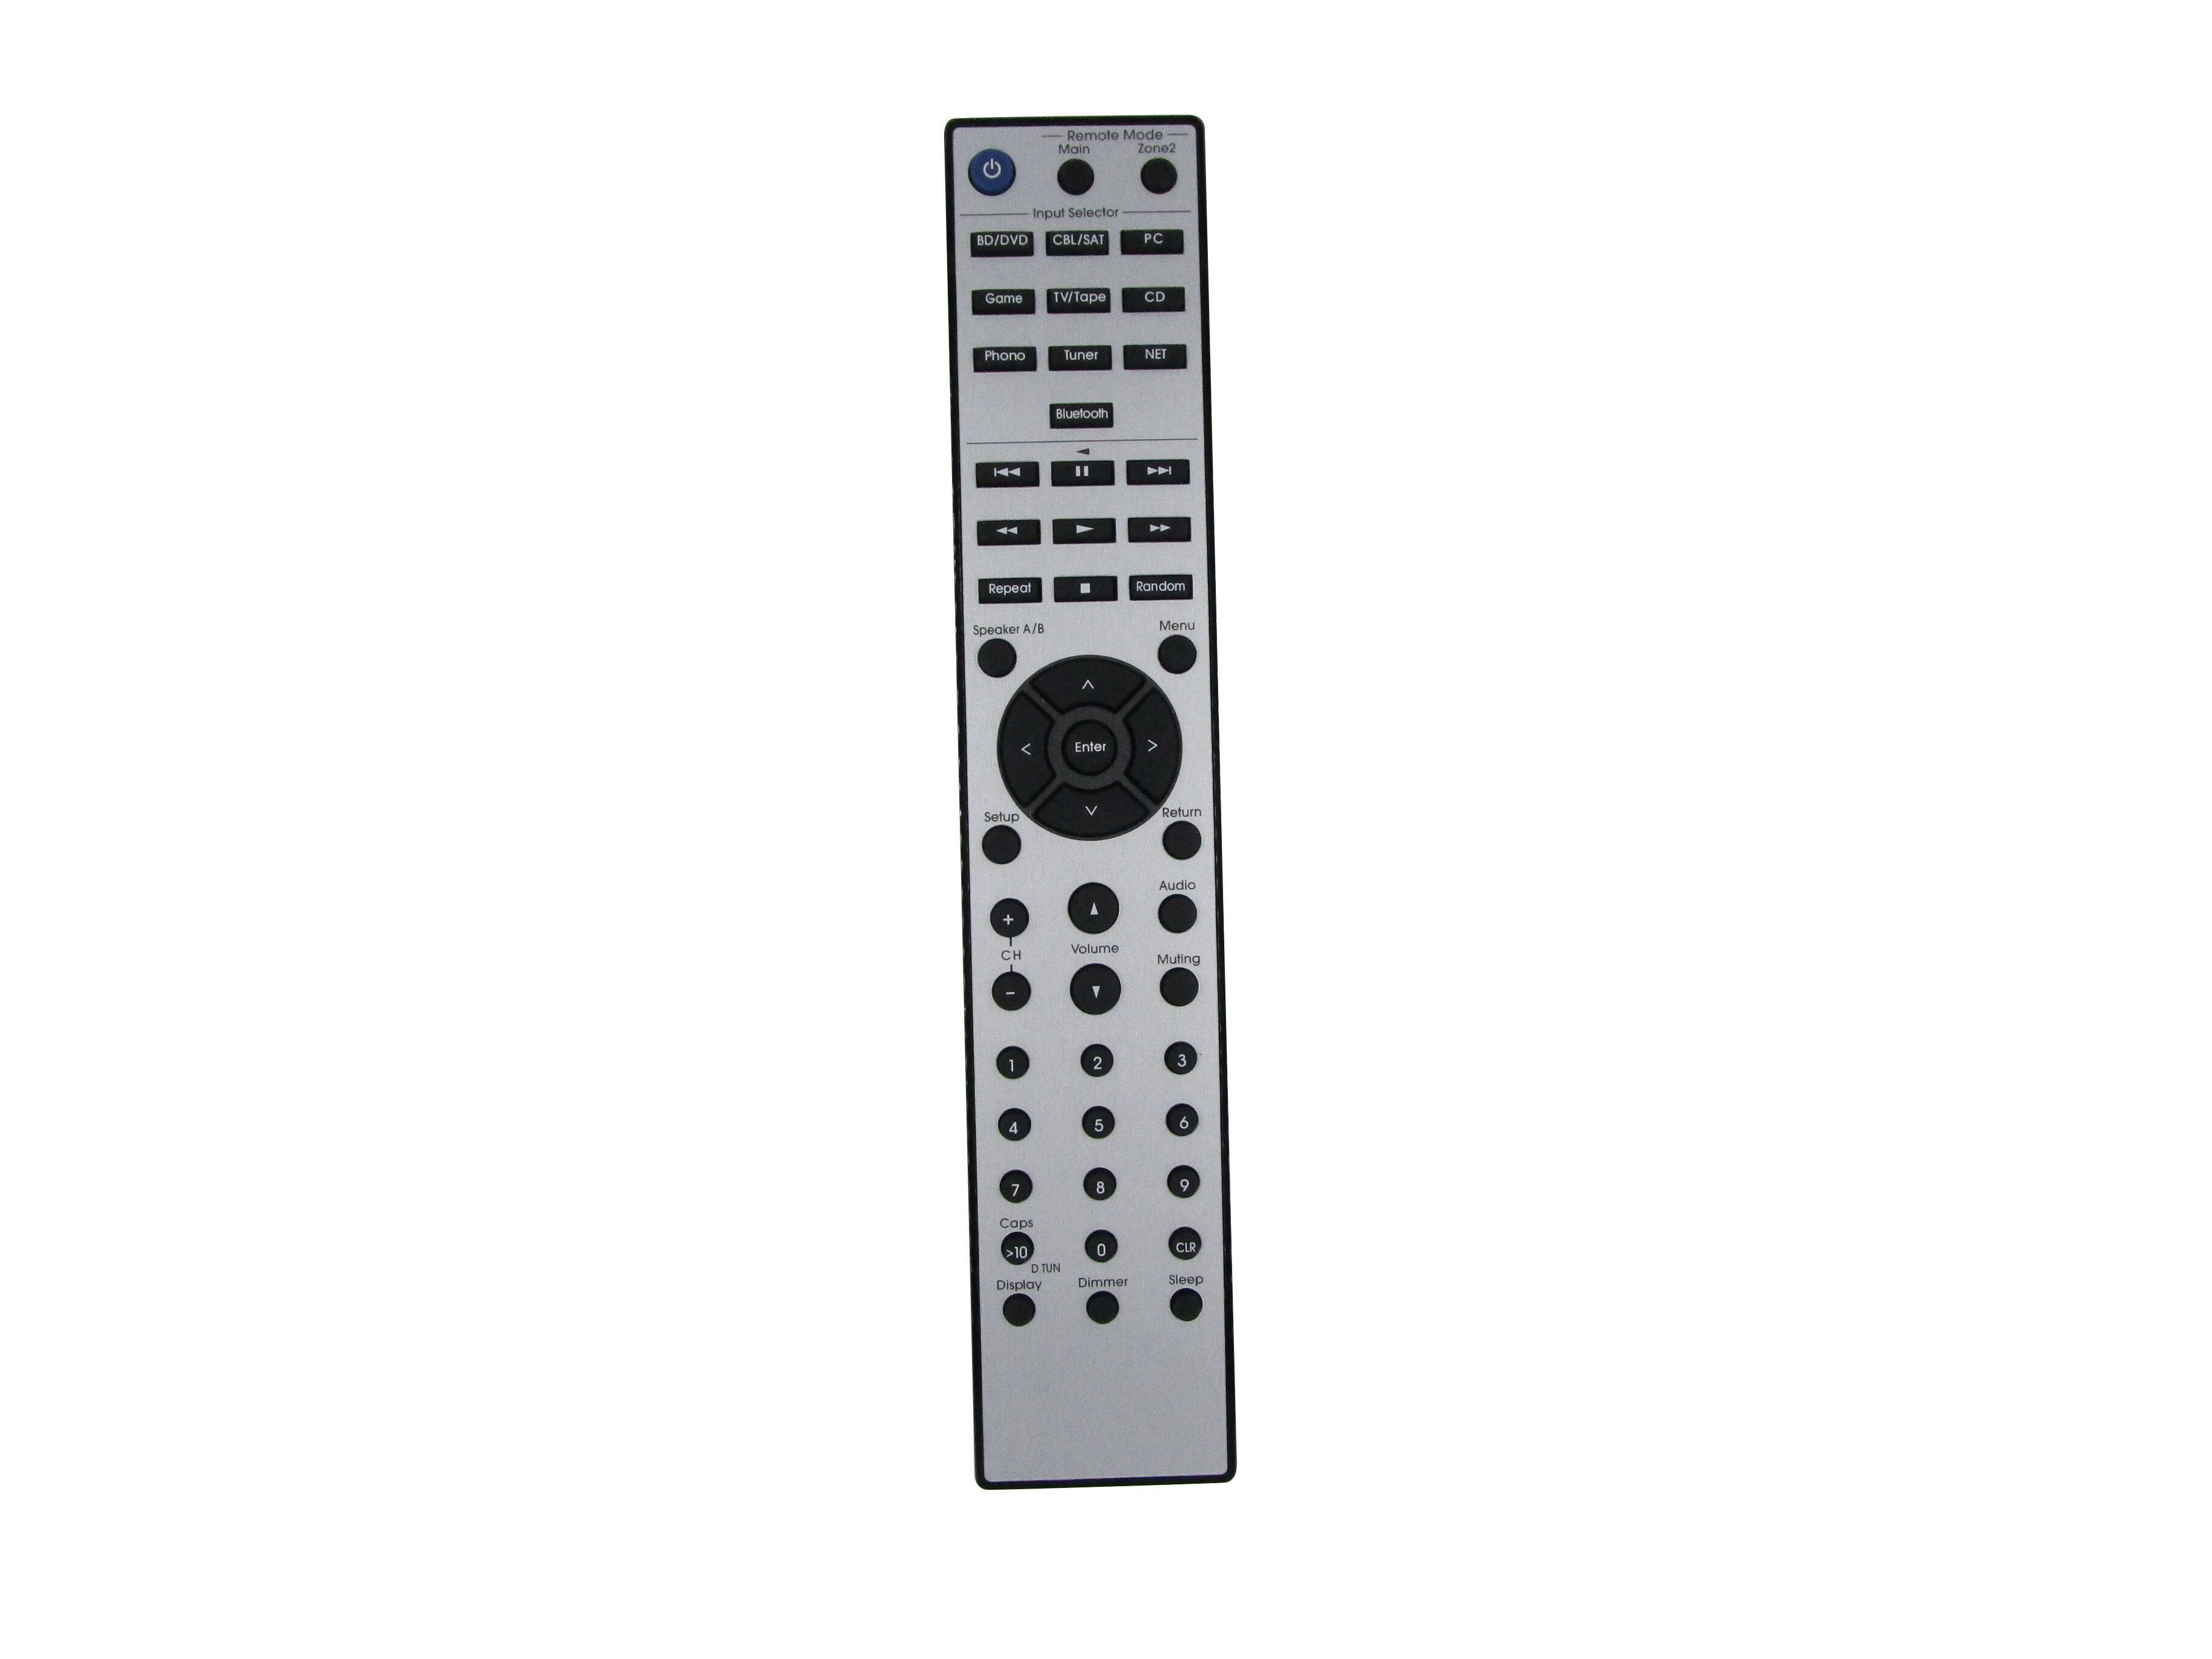 Remoto para Onkyo Rede de Áudio Controle Rc-904s Tx-8140 Rc-903s Tx-8160 – Vídeo av Receptor Estéreo Rc-815s Tx-8030 Rc-816s Tx-8050